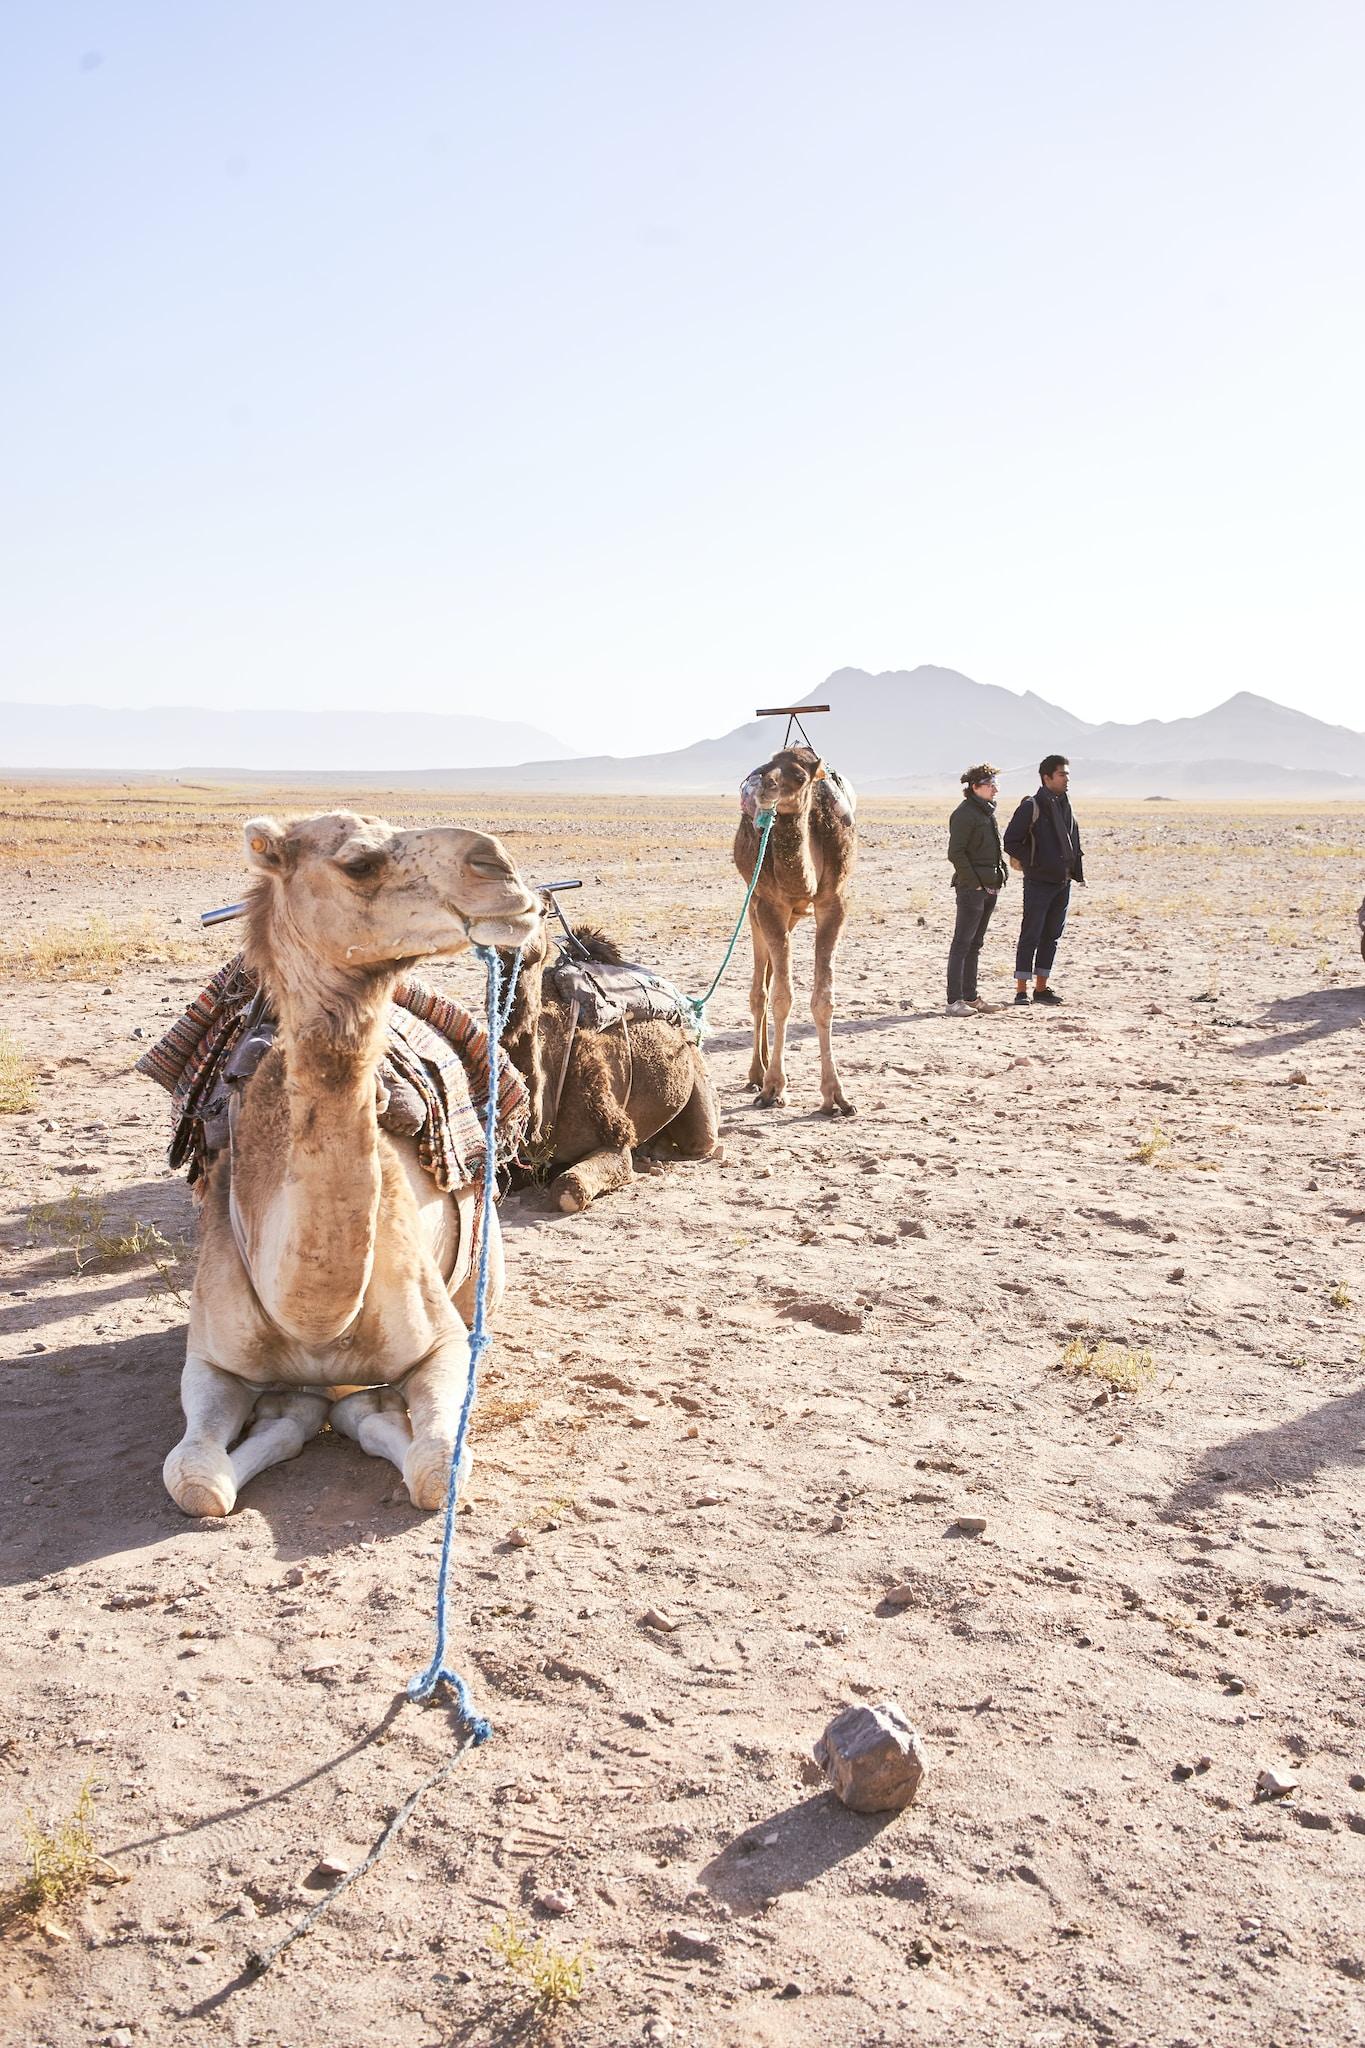 people standing beside camel on desert